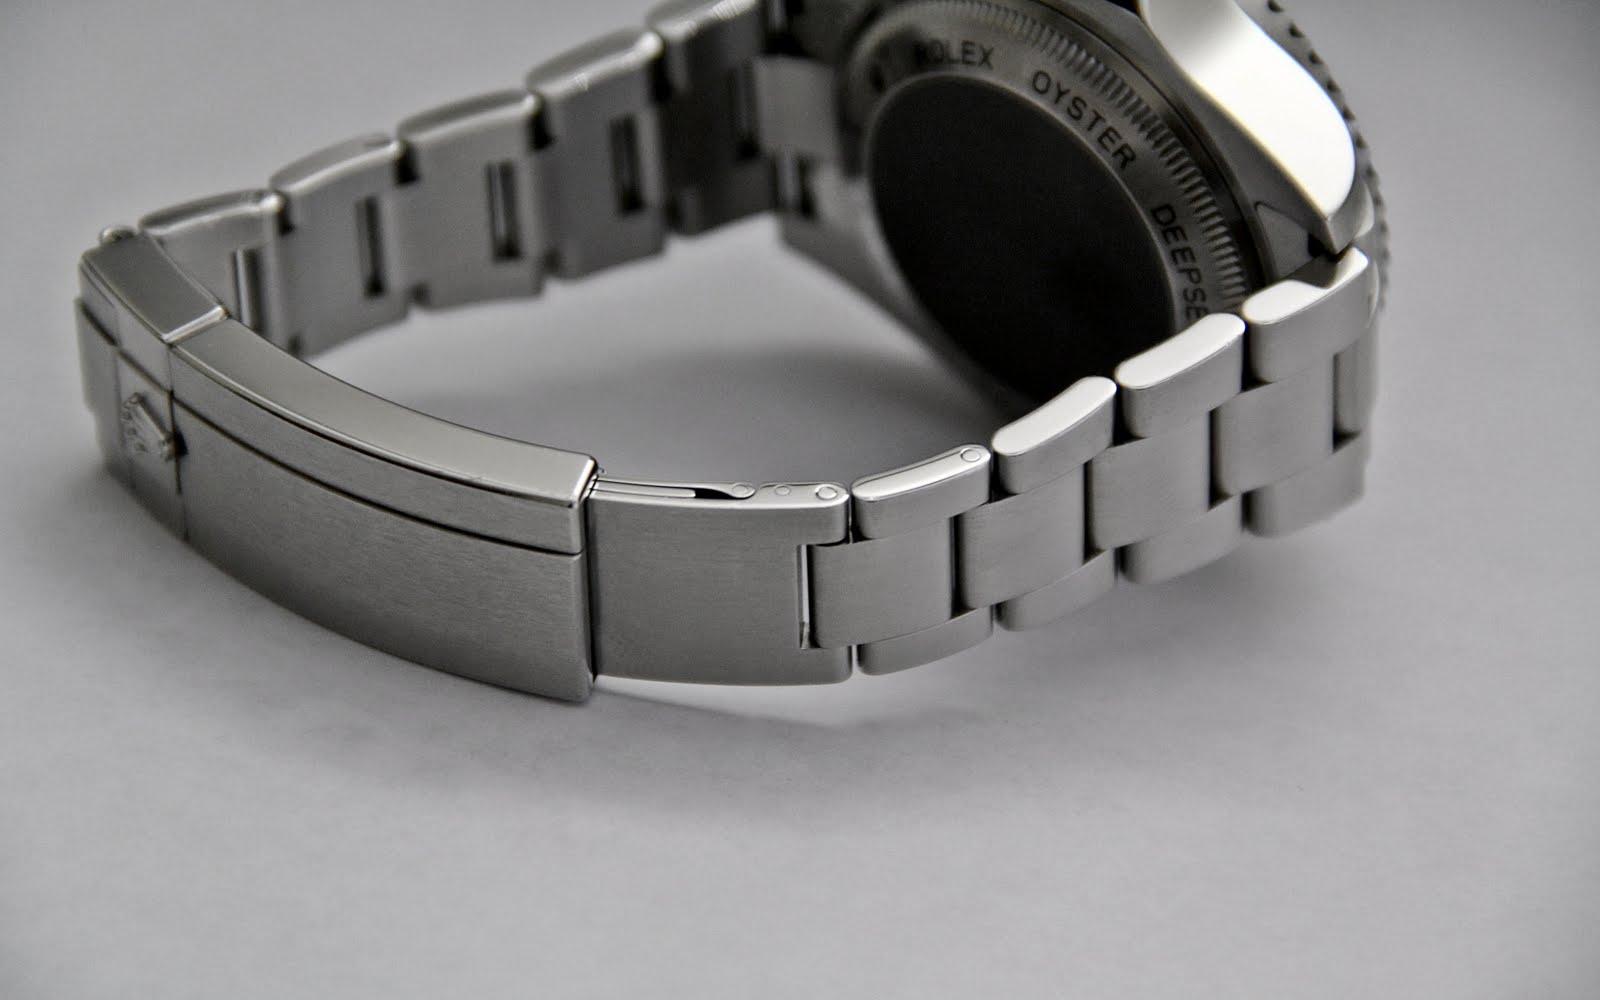 Rolex Deepsea Sea Dweller 116660 Glide Lock Clasp